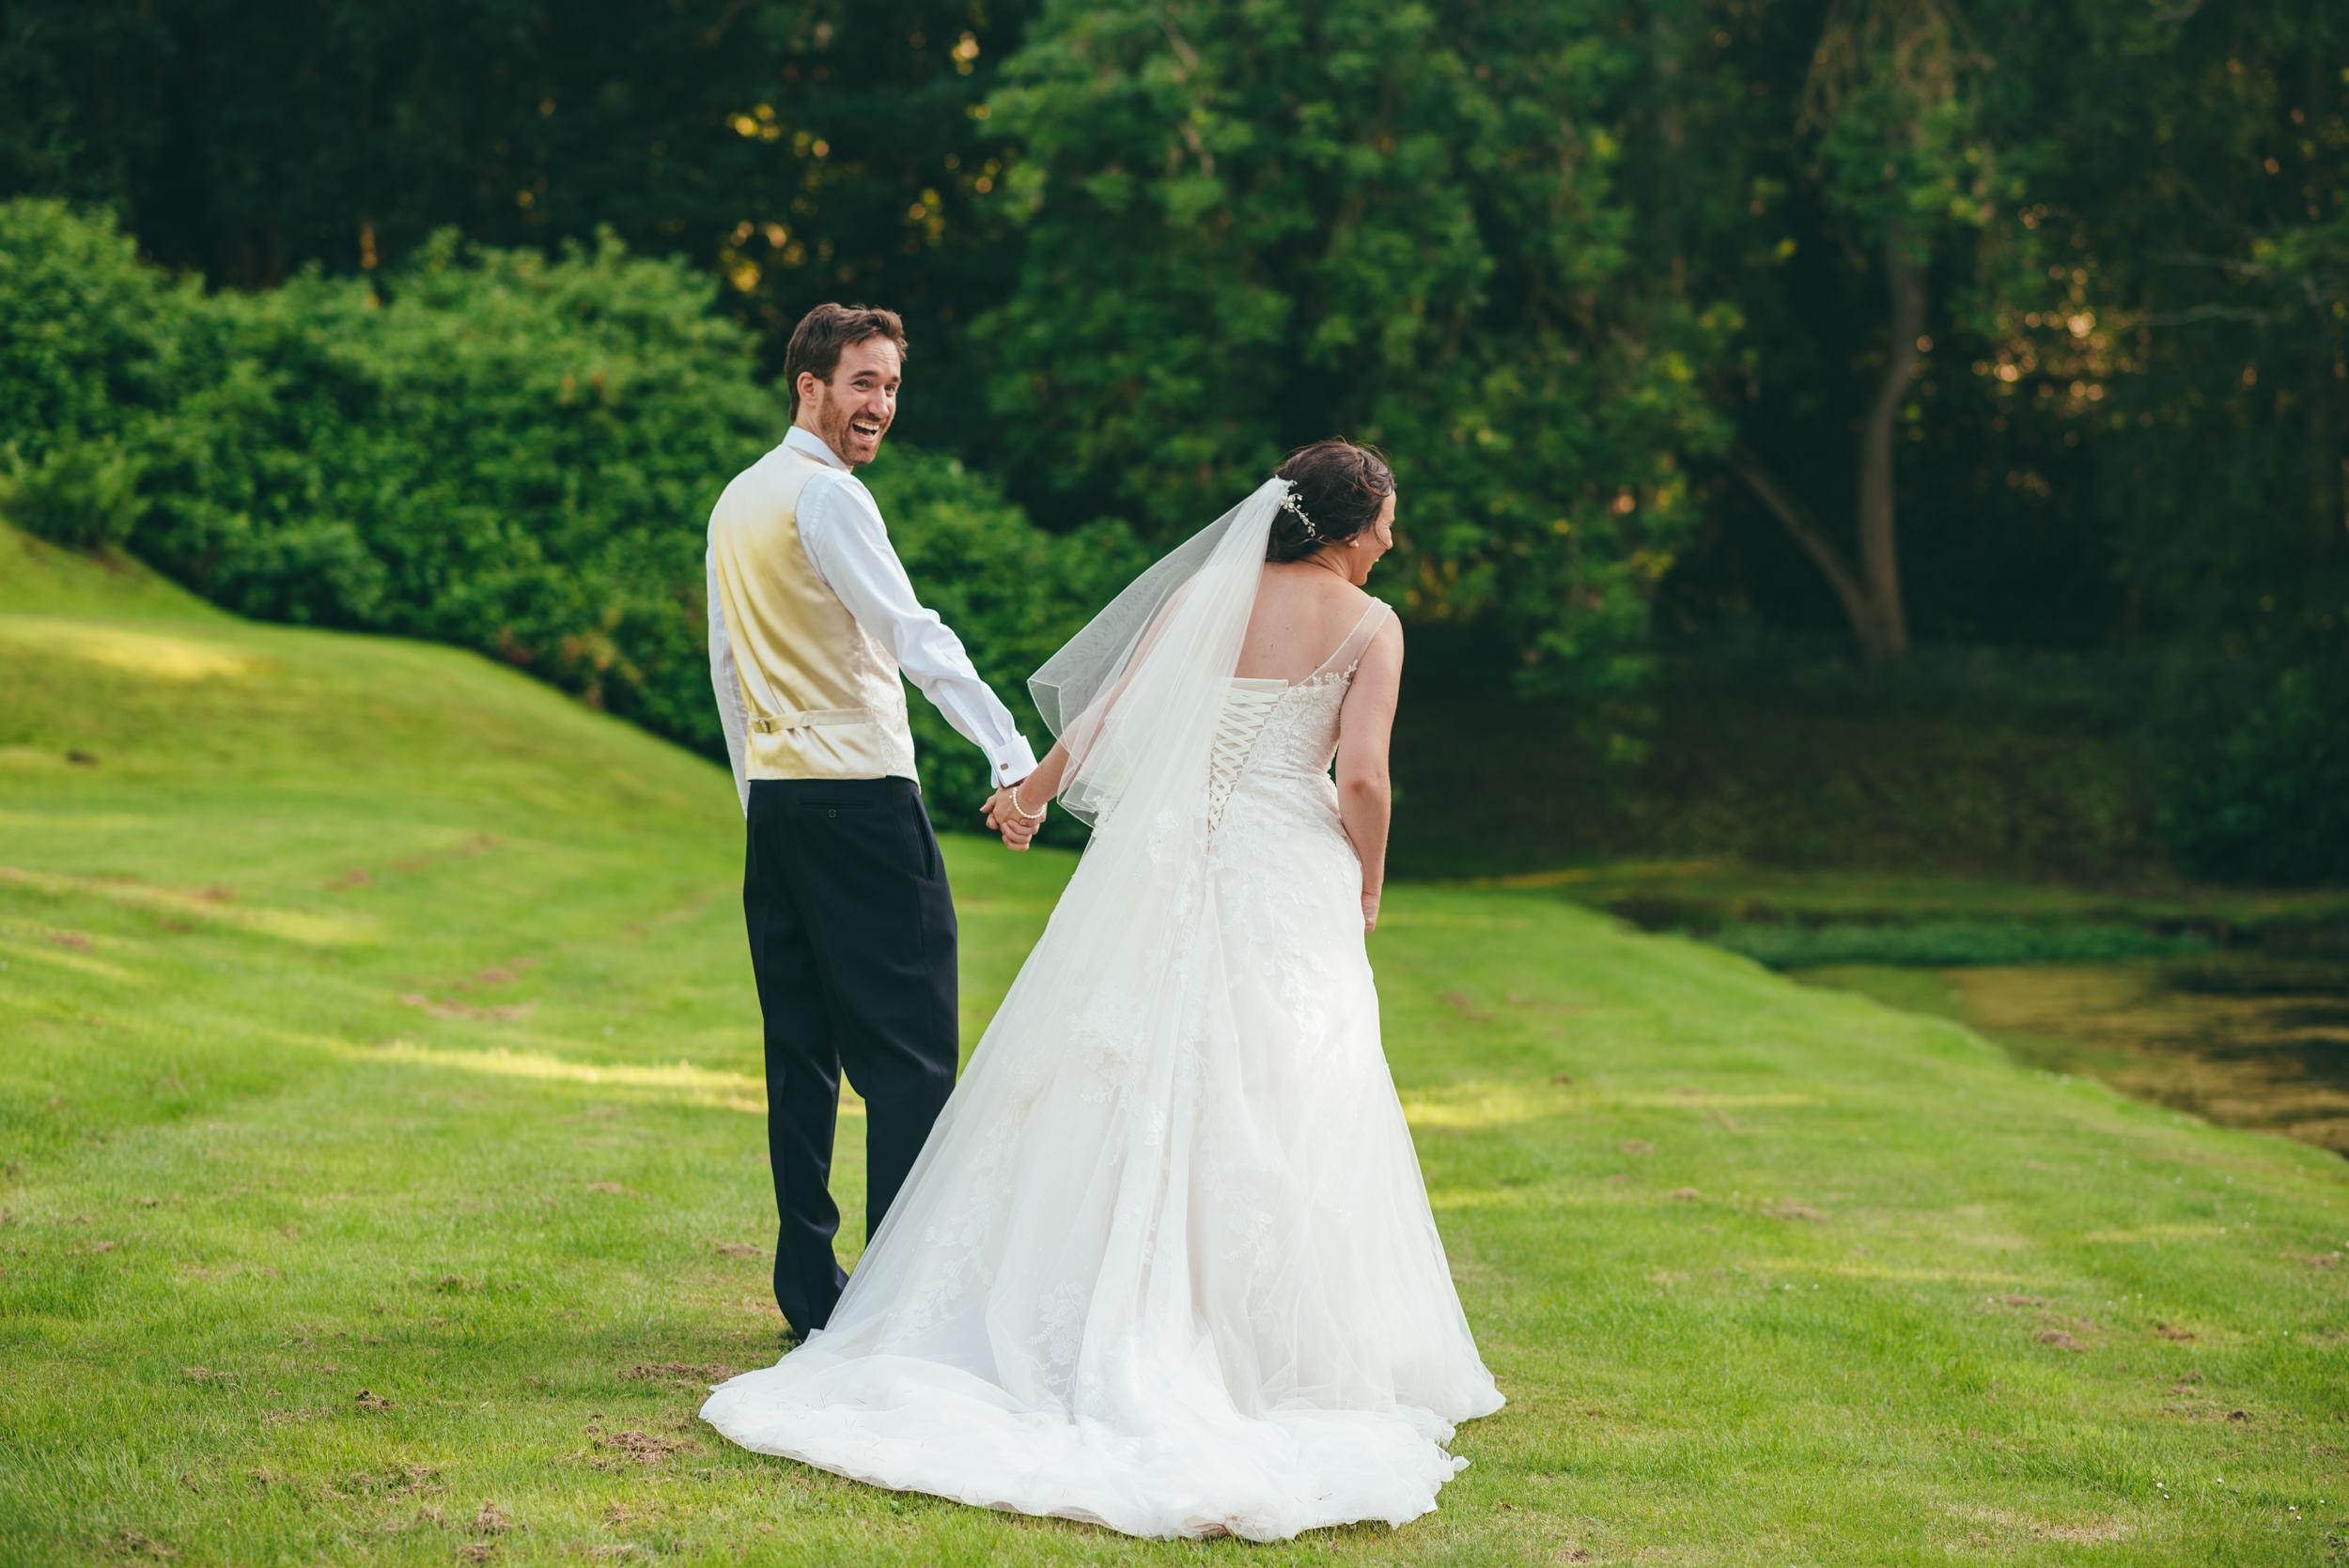 Bride and groom sharing a joke